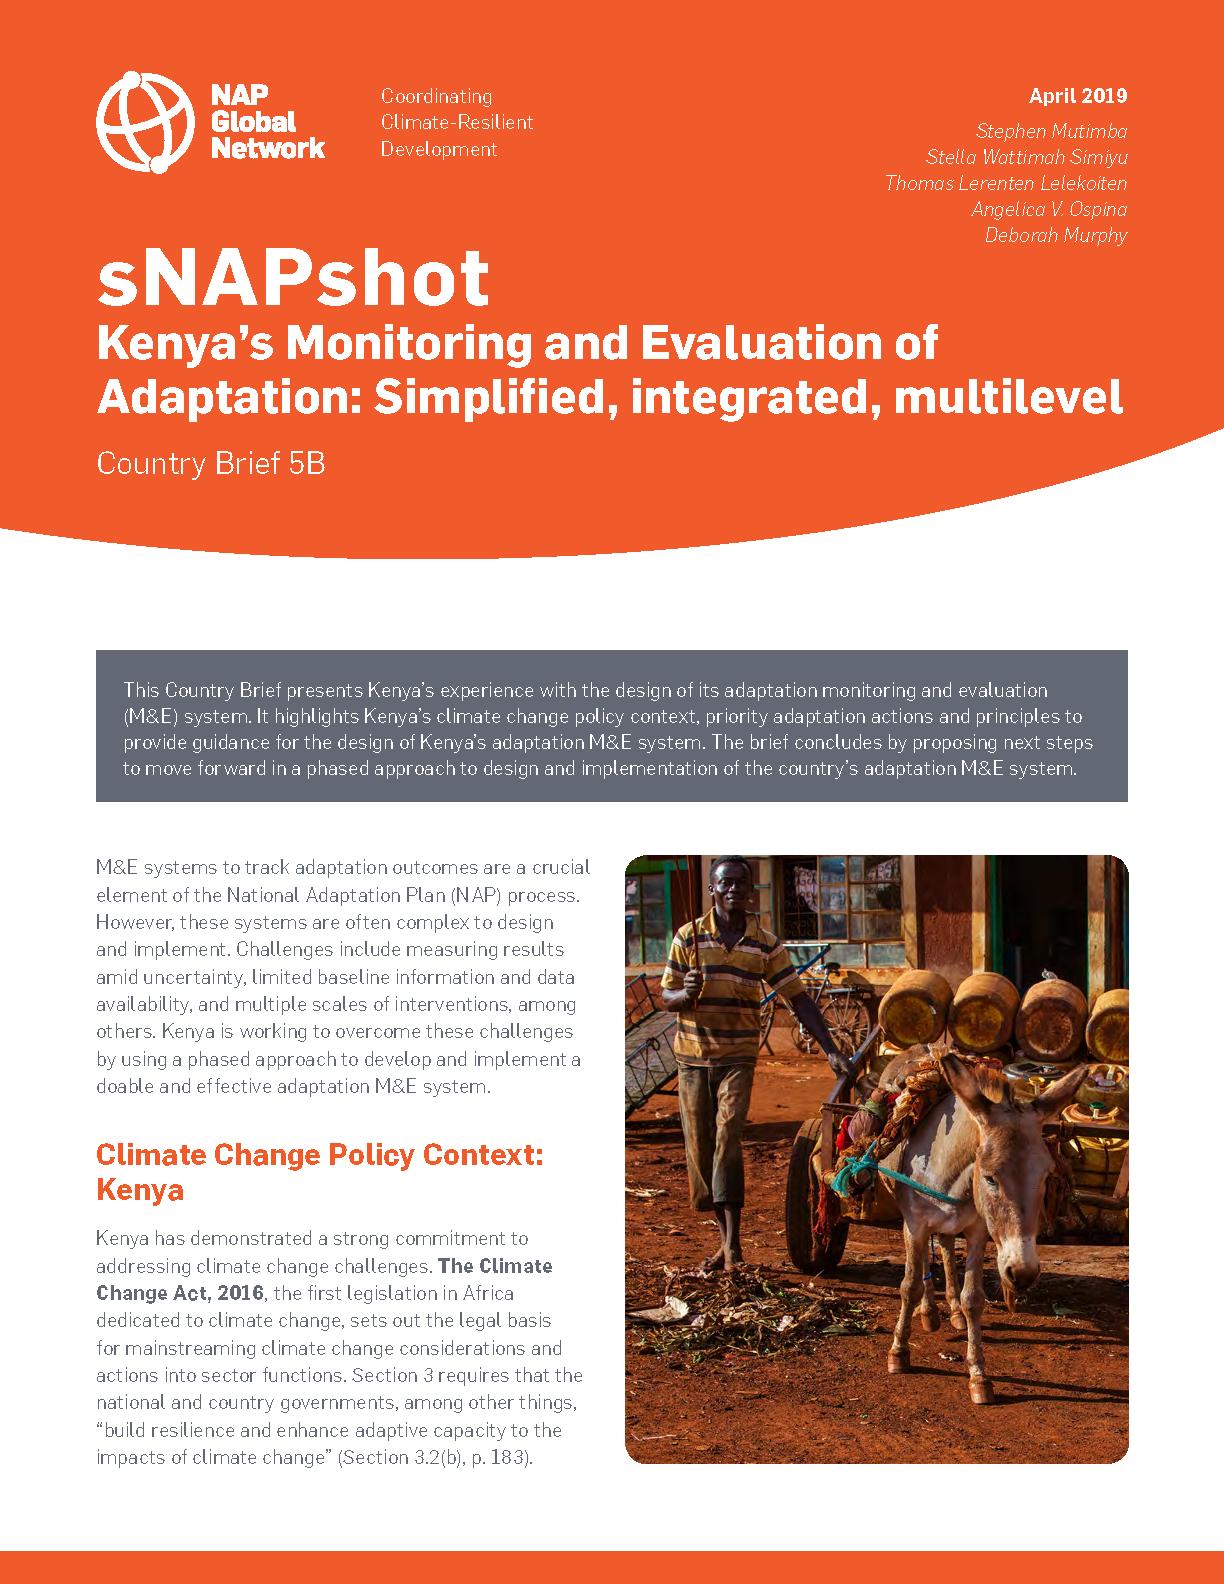 Snapshot Kenya S Monitoring And Evaluation Of Adaptation Simplified Integrated Multilevel Nap Global Network